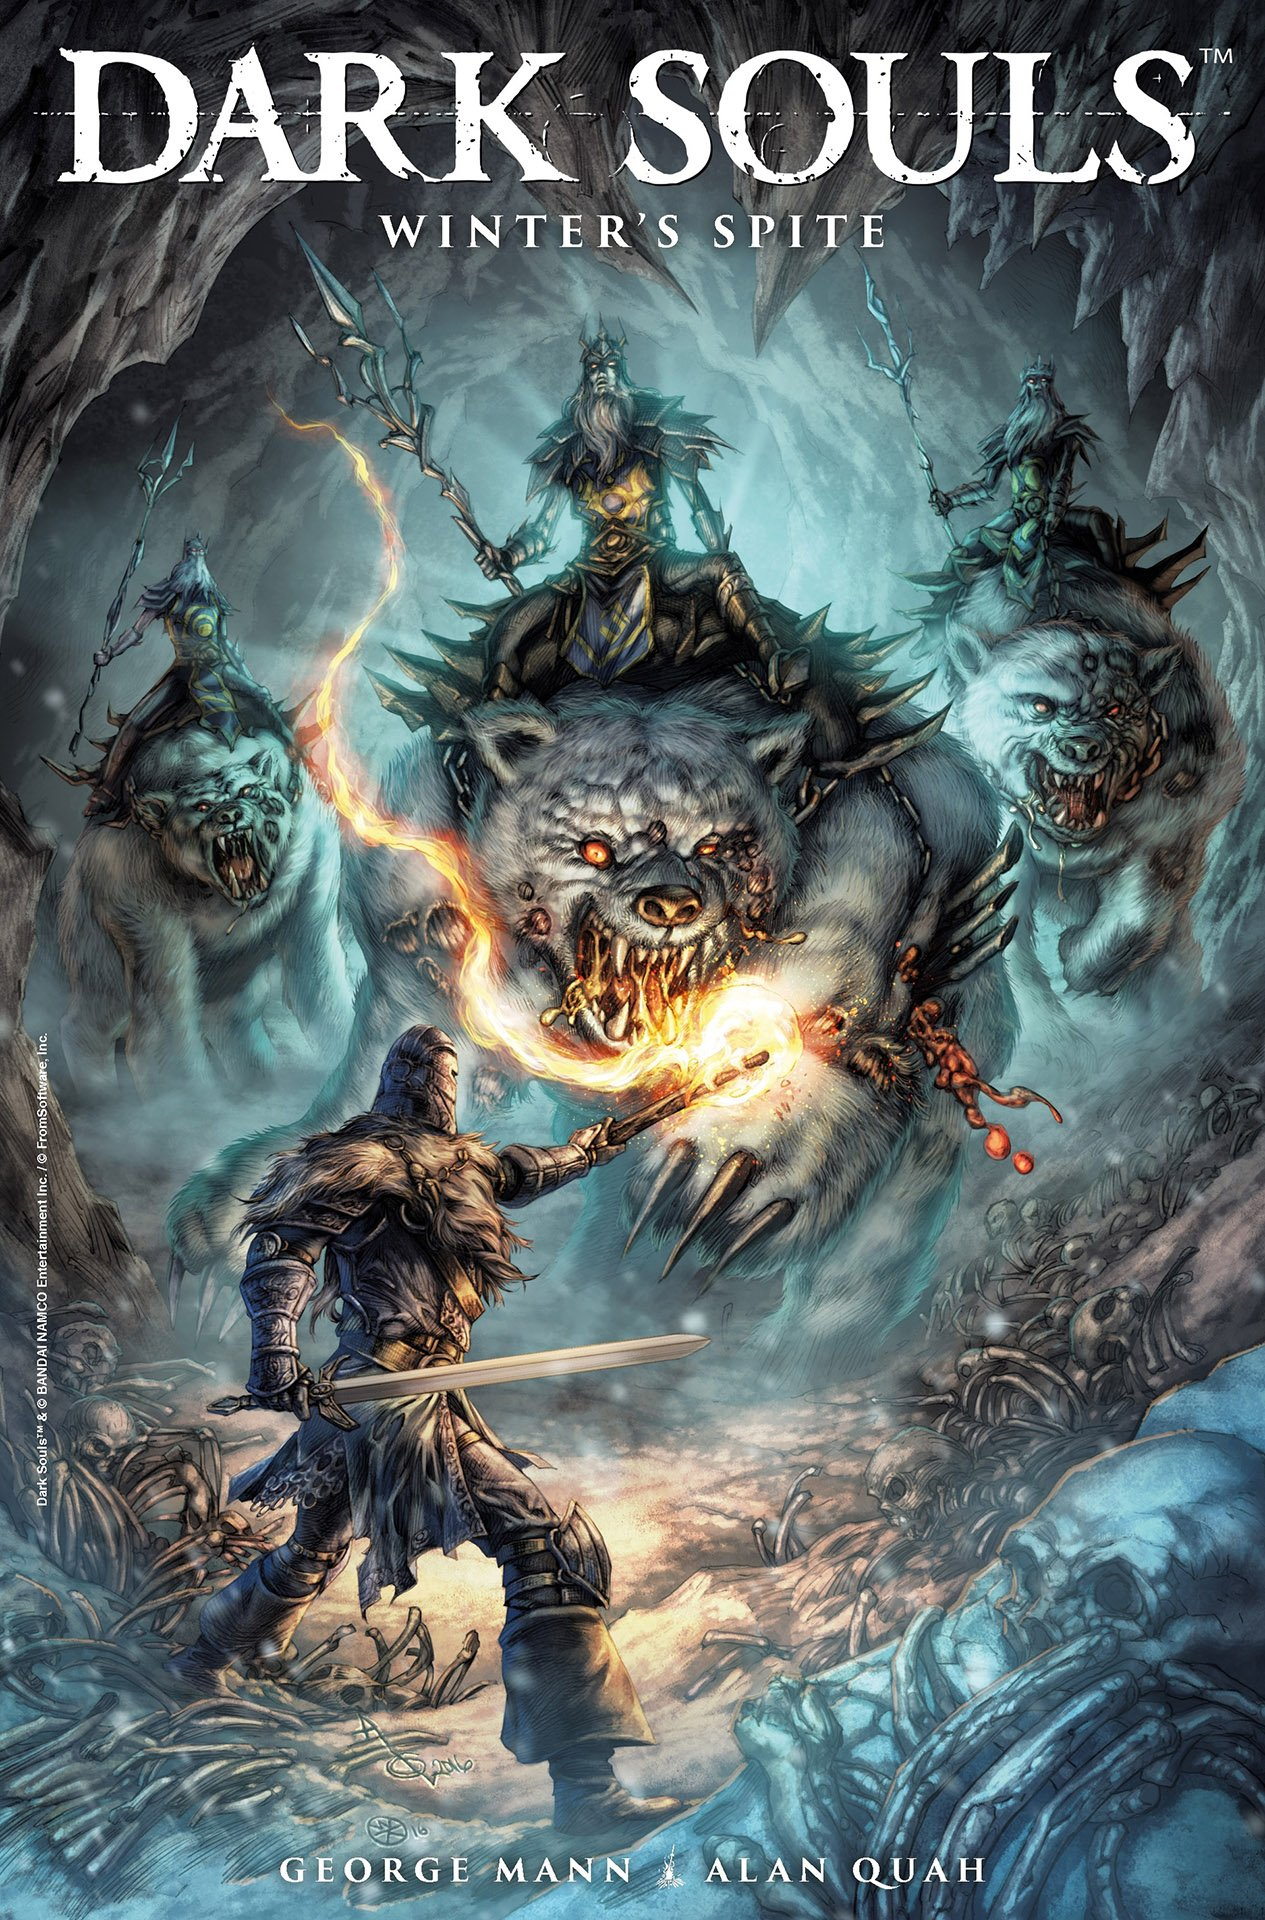 Dark Souls: Winter's Spite 003 (February 2017) (cover a)